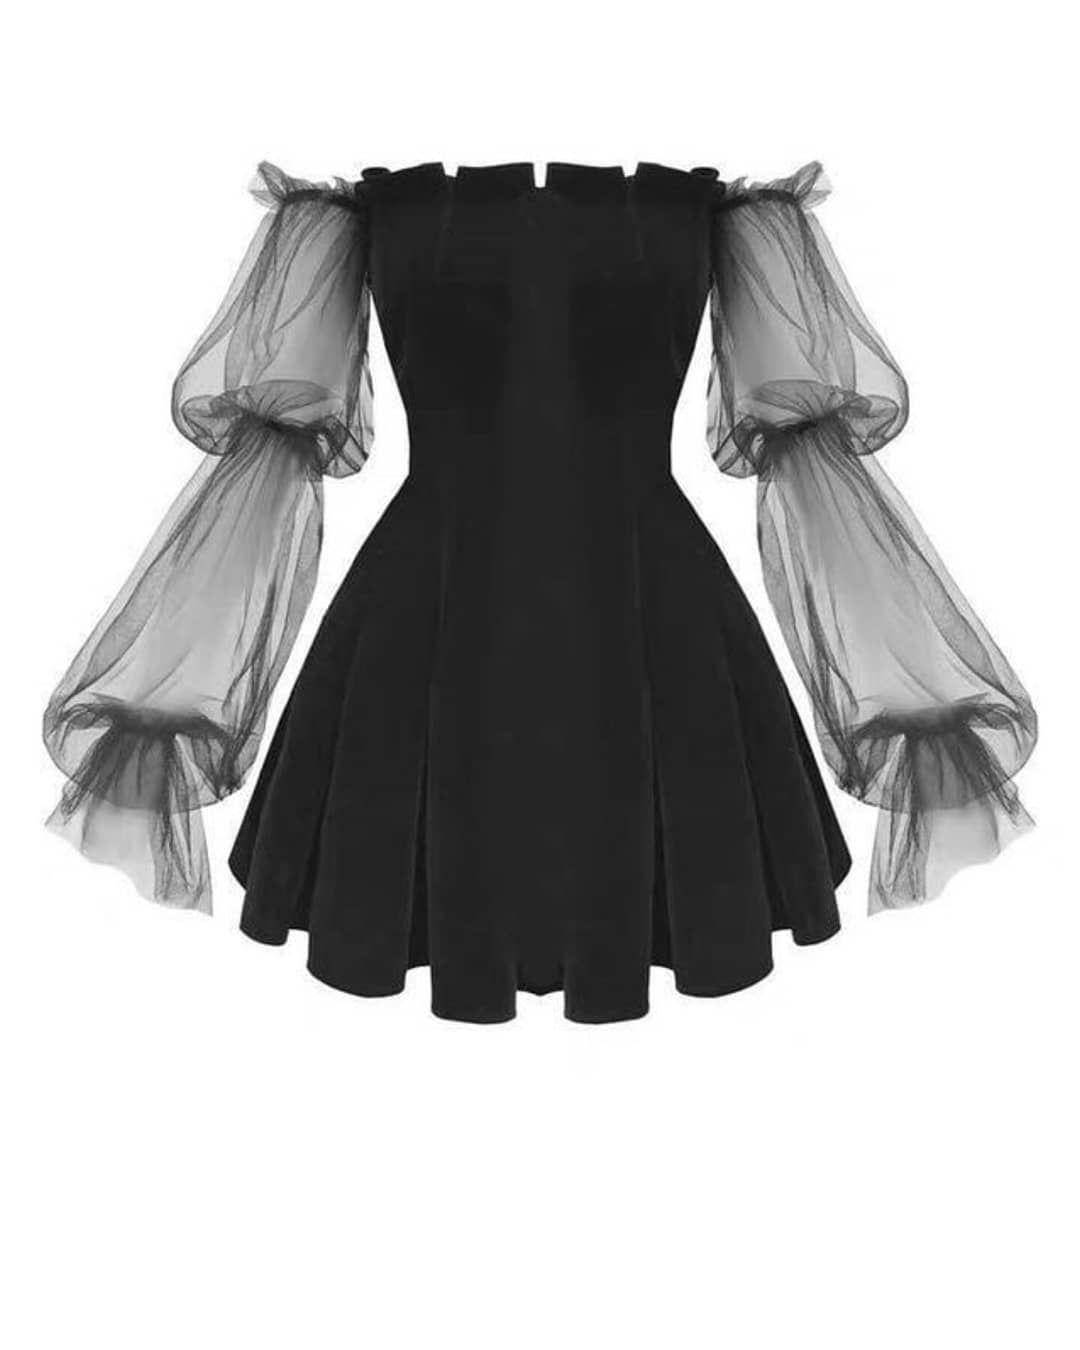 1 493 Otmetok Nravitsya 23 Kommentariev Dress Queen Dresshow V Instagram Which One Mini Dress With Sleeves Fashion Dresses With Sleeves [ 1350 x 1080 Pixel ]